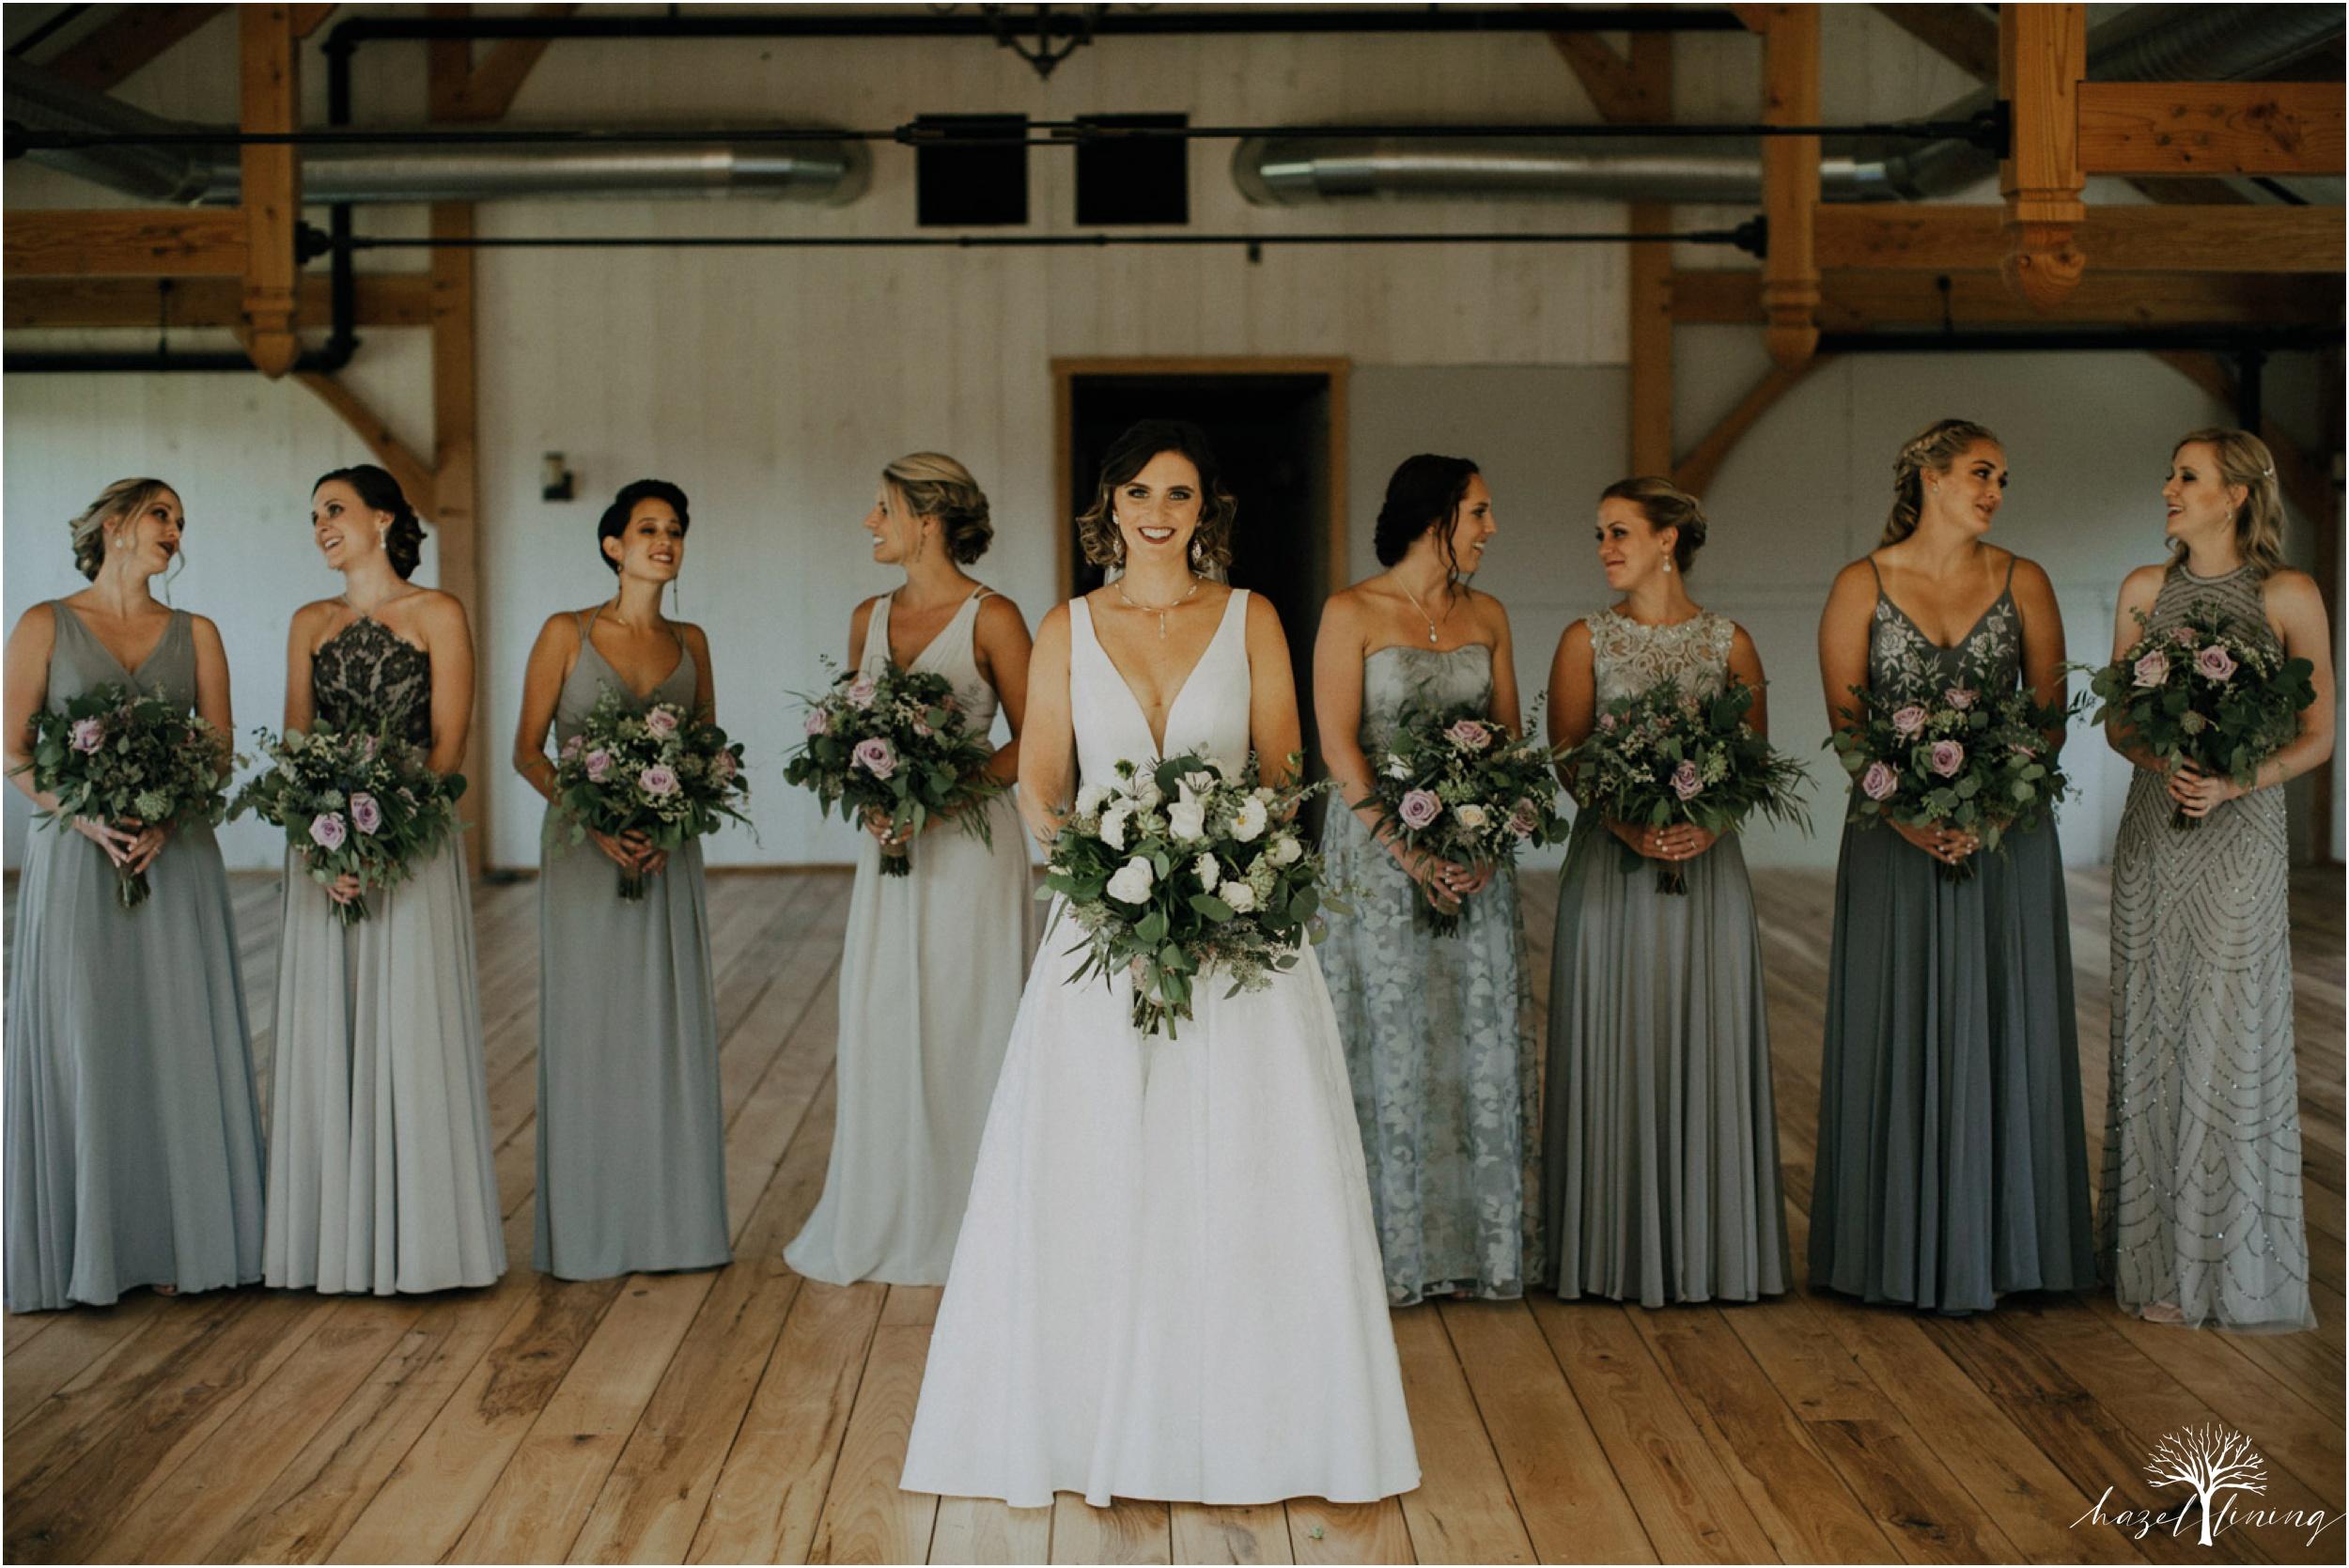 maureen-hepner-anthony-giordano-rose-bank-winery-newtow-pennsylvania-luxury-summer-wedding-hazel-lining-photography-destination-elopement-wedding-engagement-photography_0028.jpg